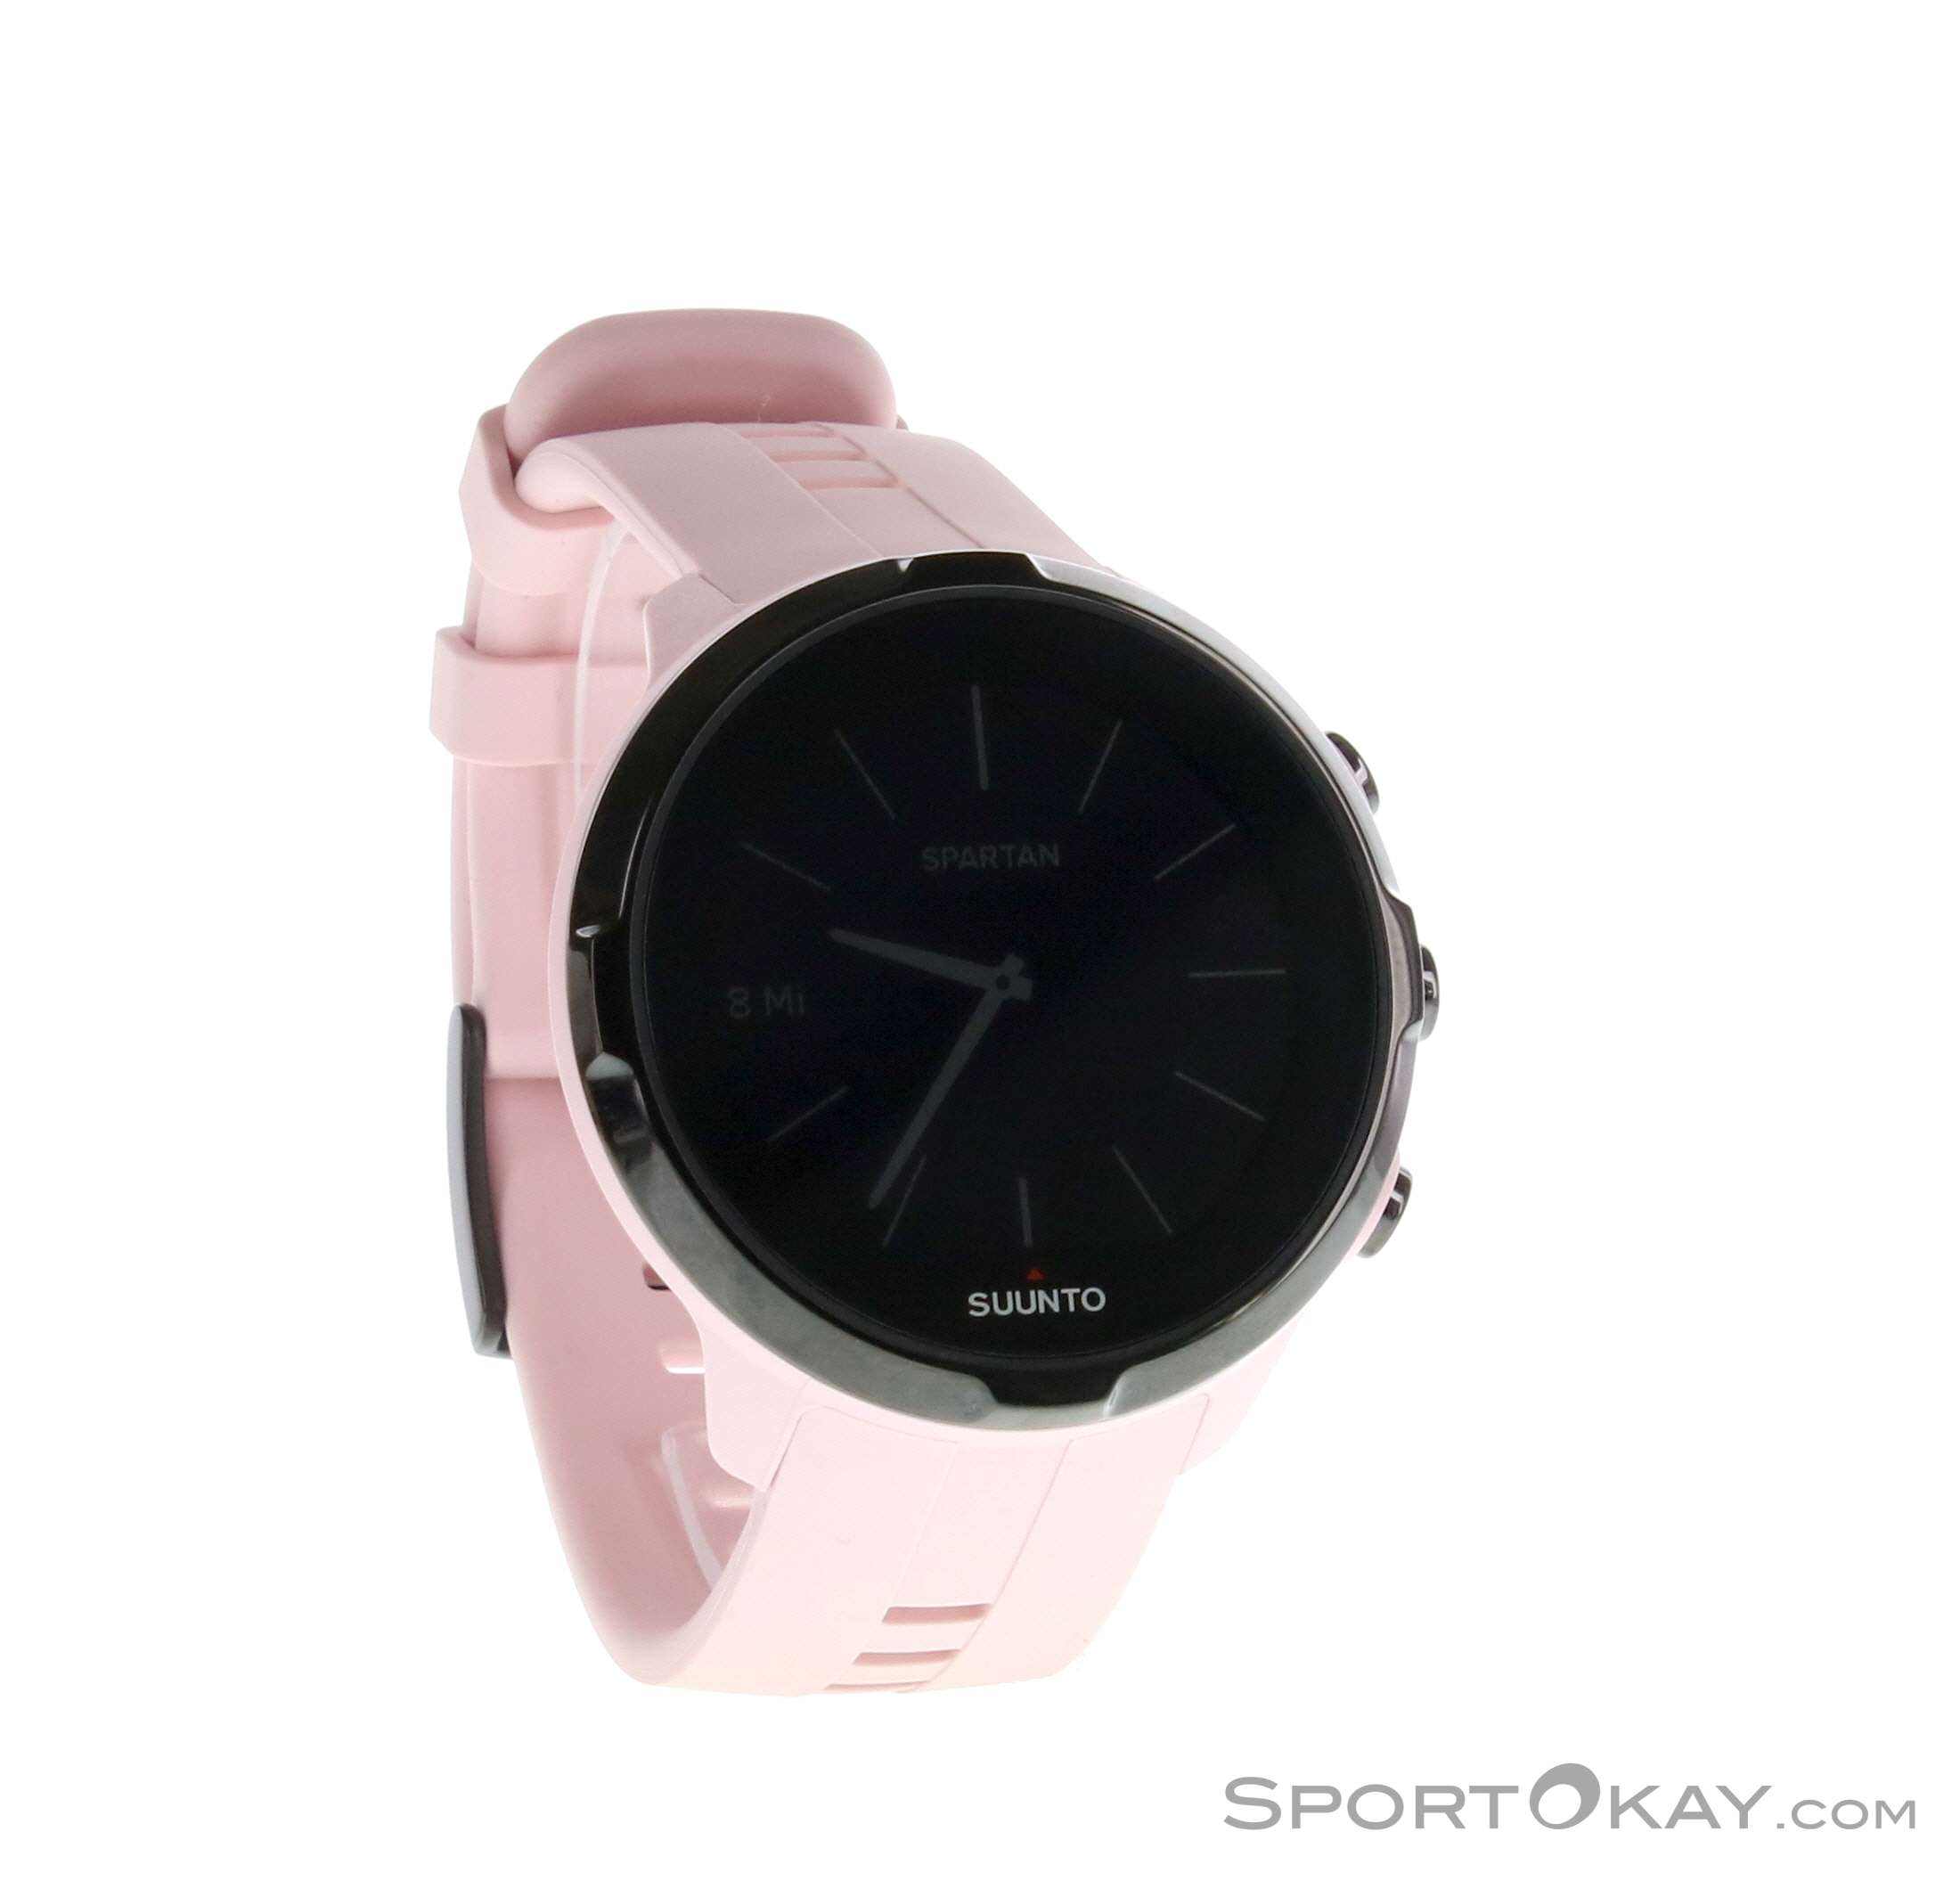 Suunto Spartan Sport Wrist Hr Gps Sports Watch Running Ambit3 Black For Outdoor Pink Male